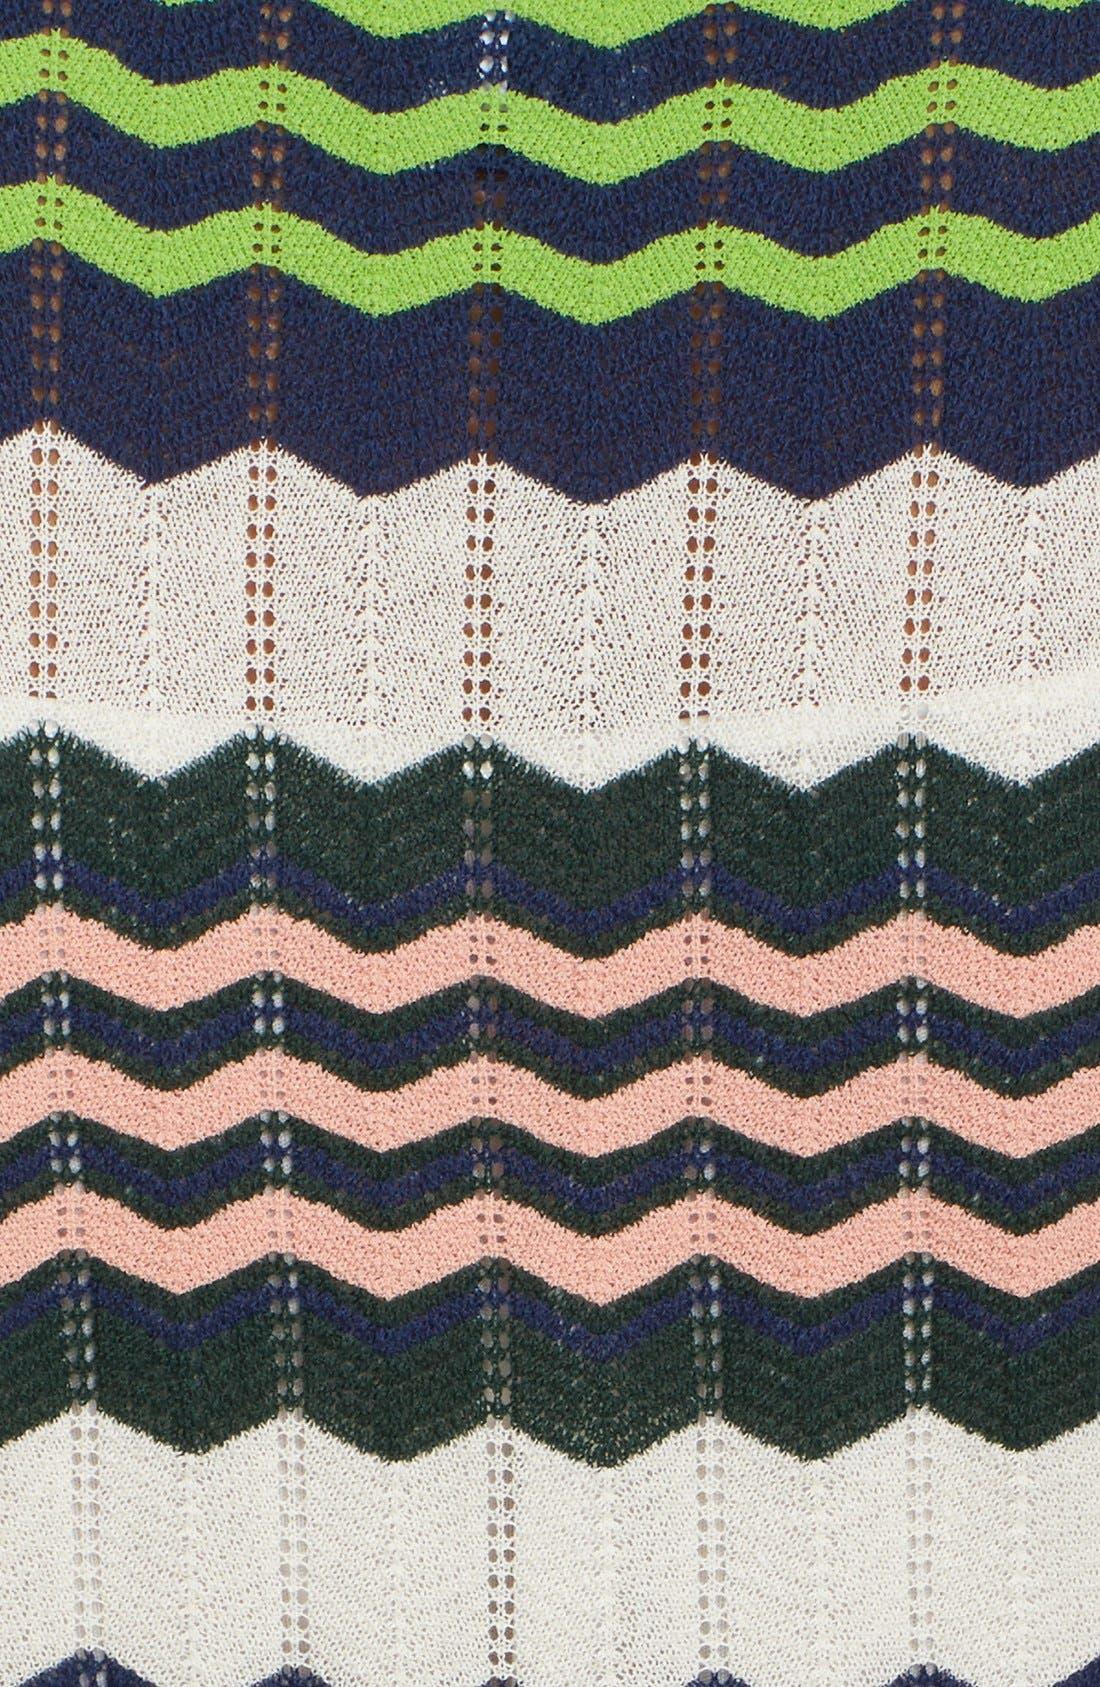 Zigzag Stripe Knit A-Line Dress,                             Alternate thumbnail 5, color,                             900